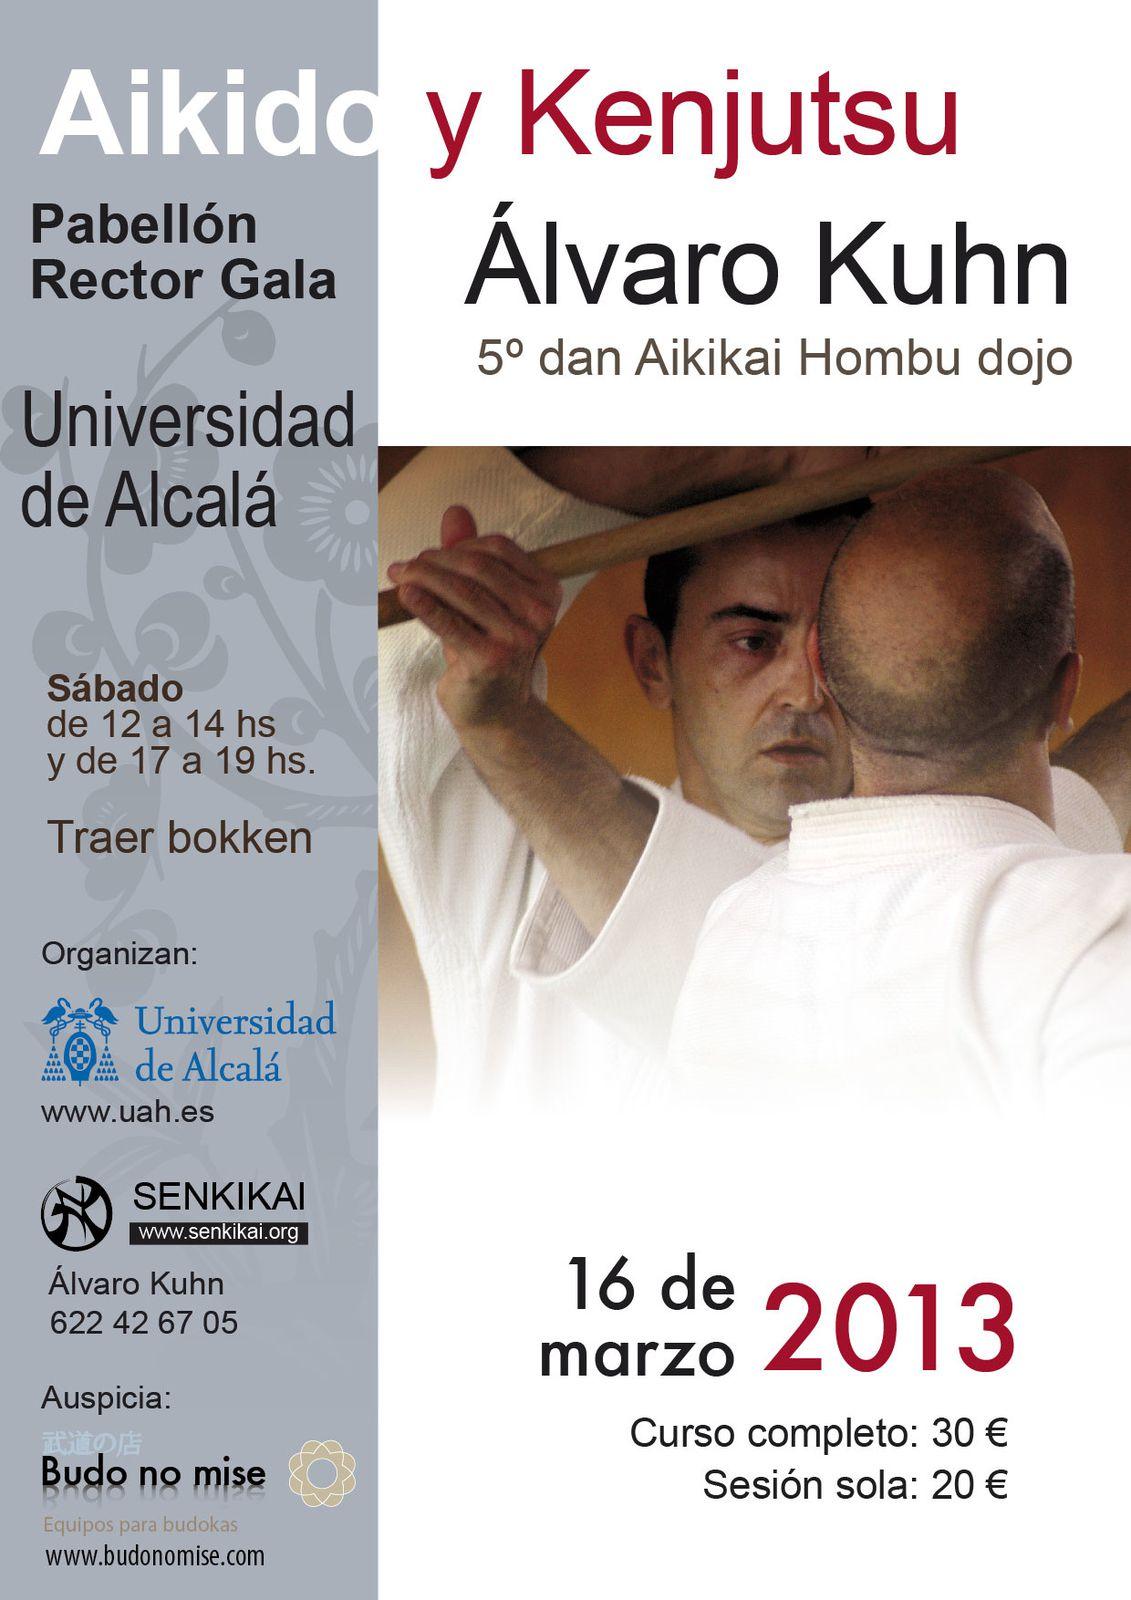 2013-03-16 - Álvaro Kuhn